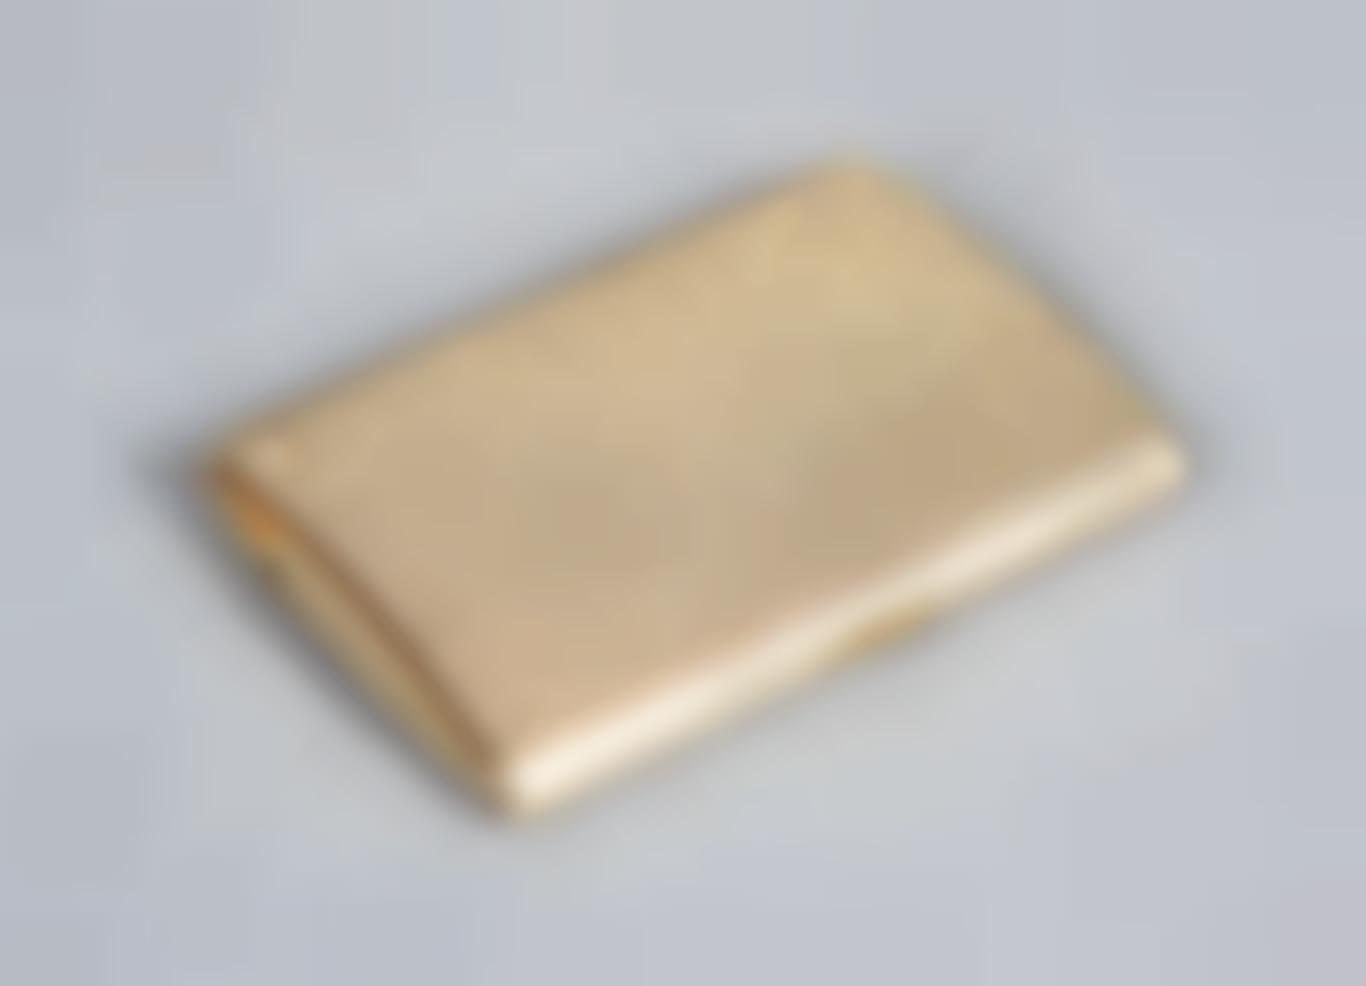 Agilt Metal Cigarette Case Lighter-